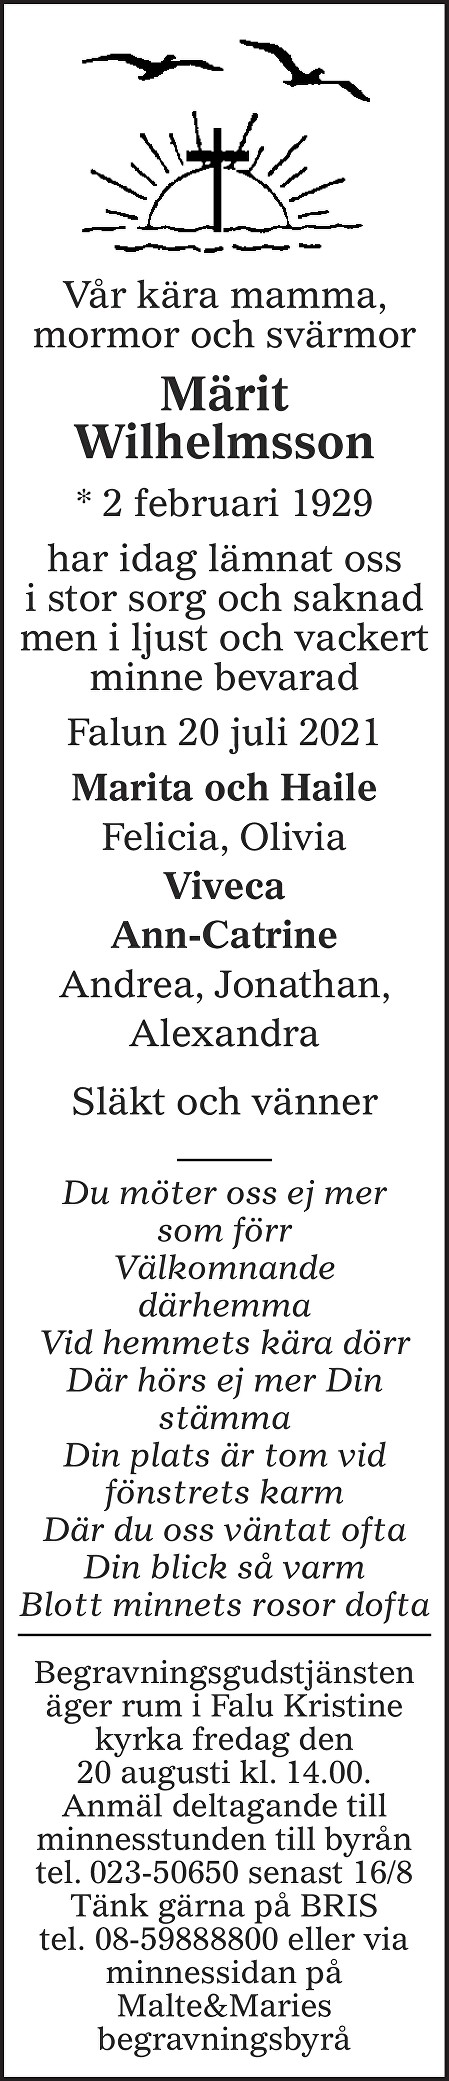 Märit Wilhelmsson Death notice